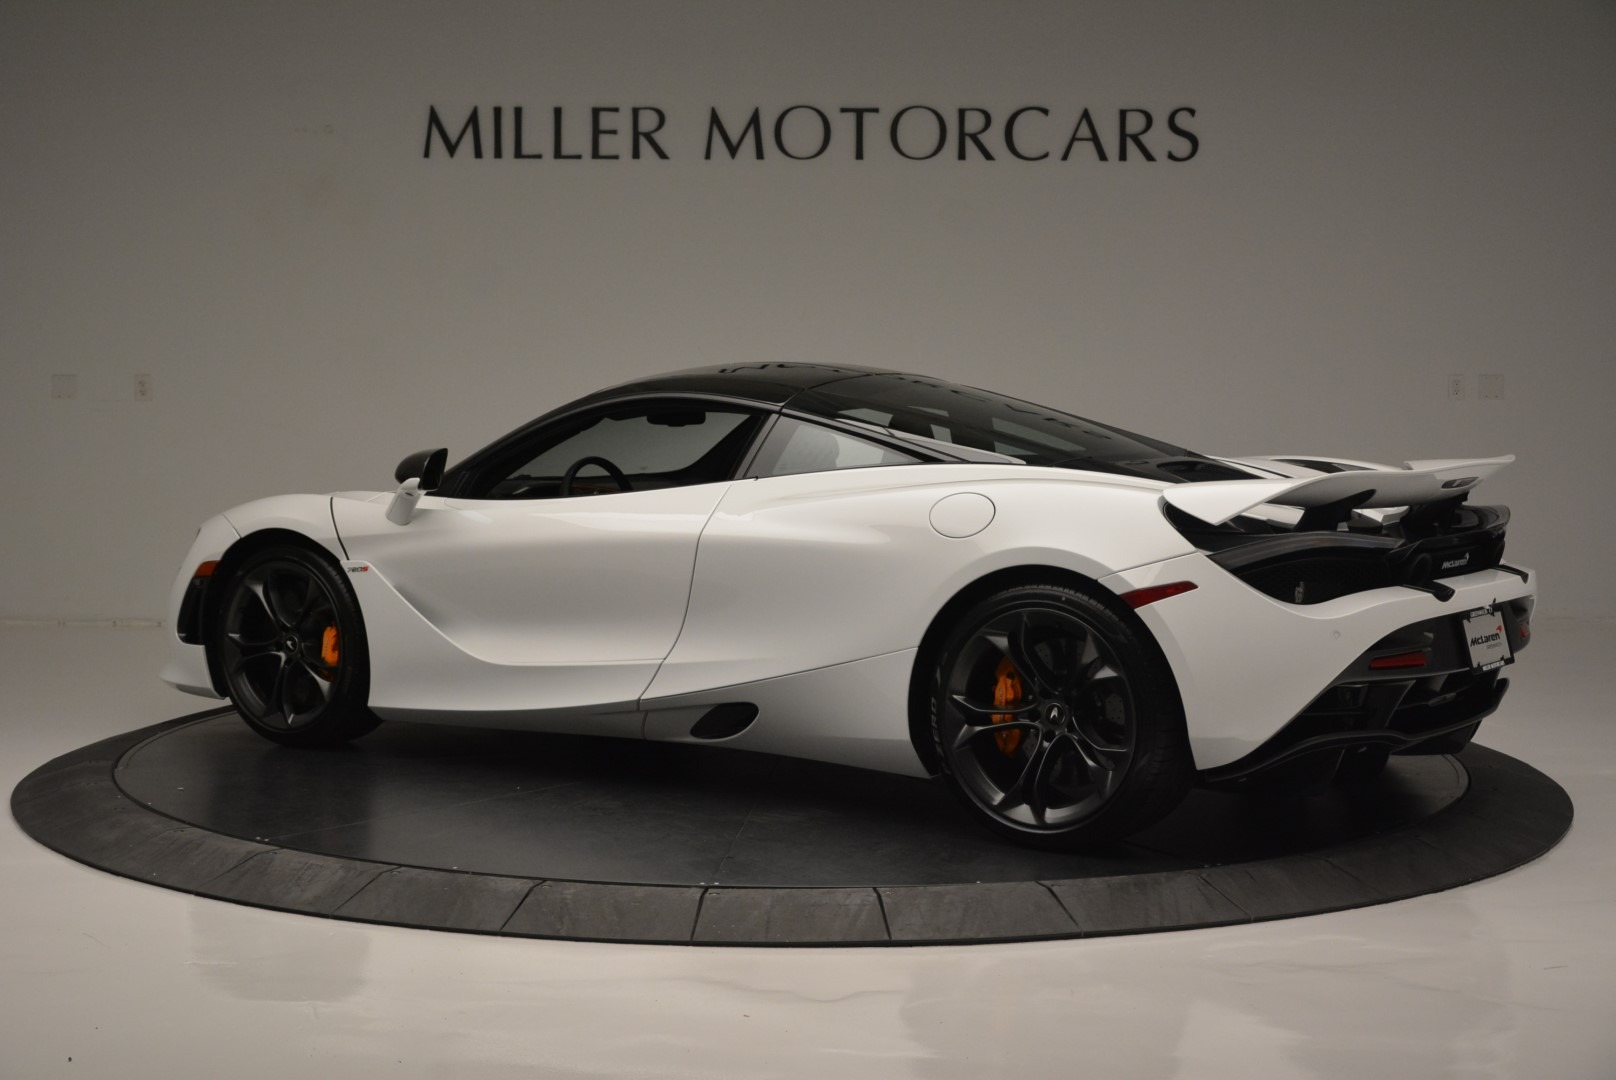 Used 2019 McLaren 720S Coupe For Sale In Westport, CT 2543_p4